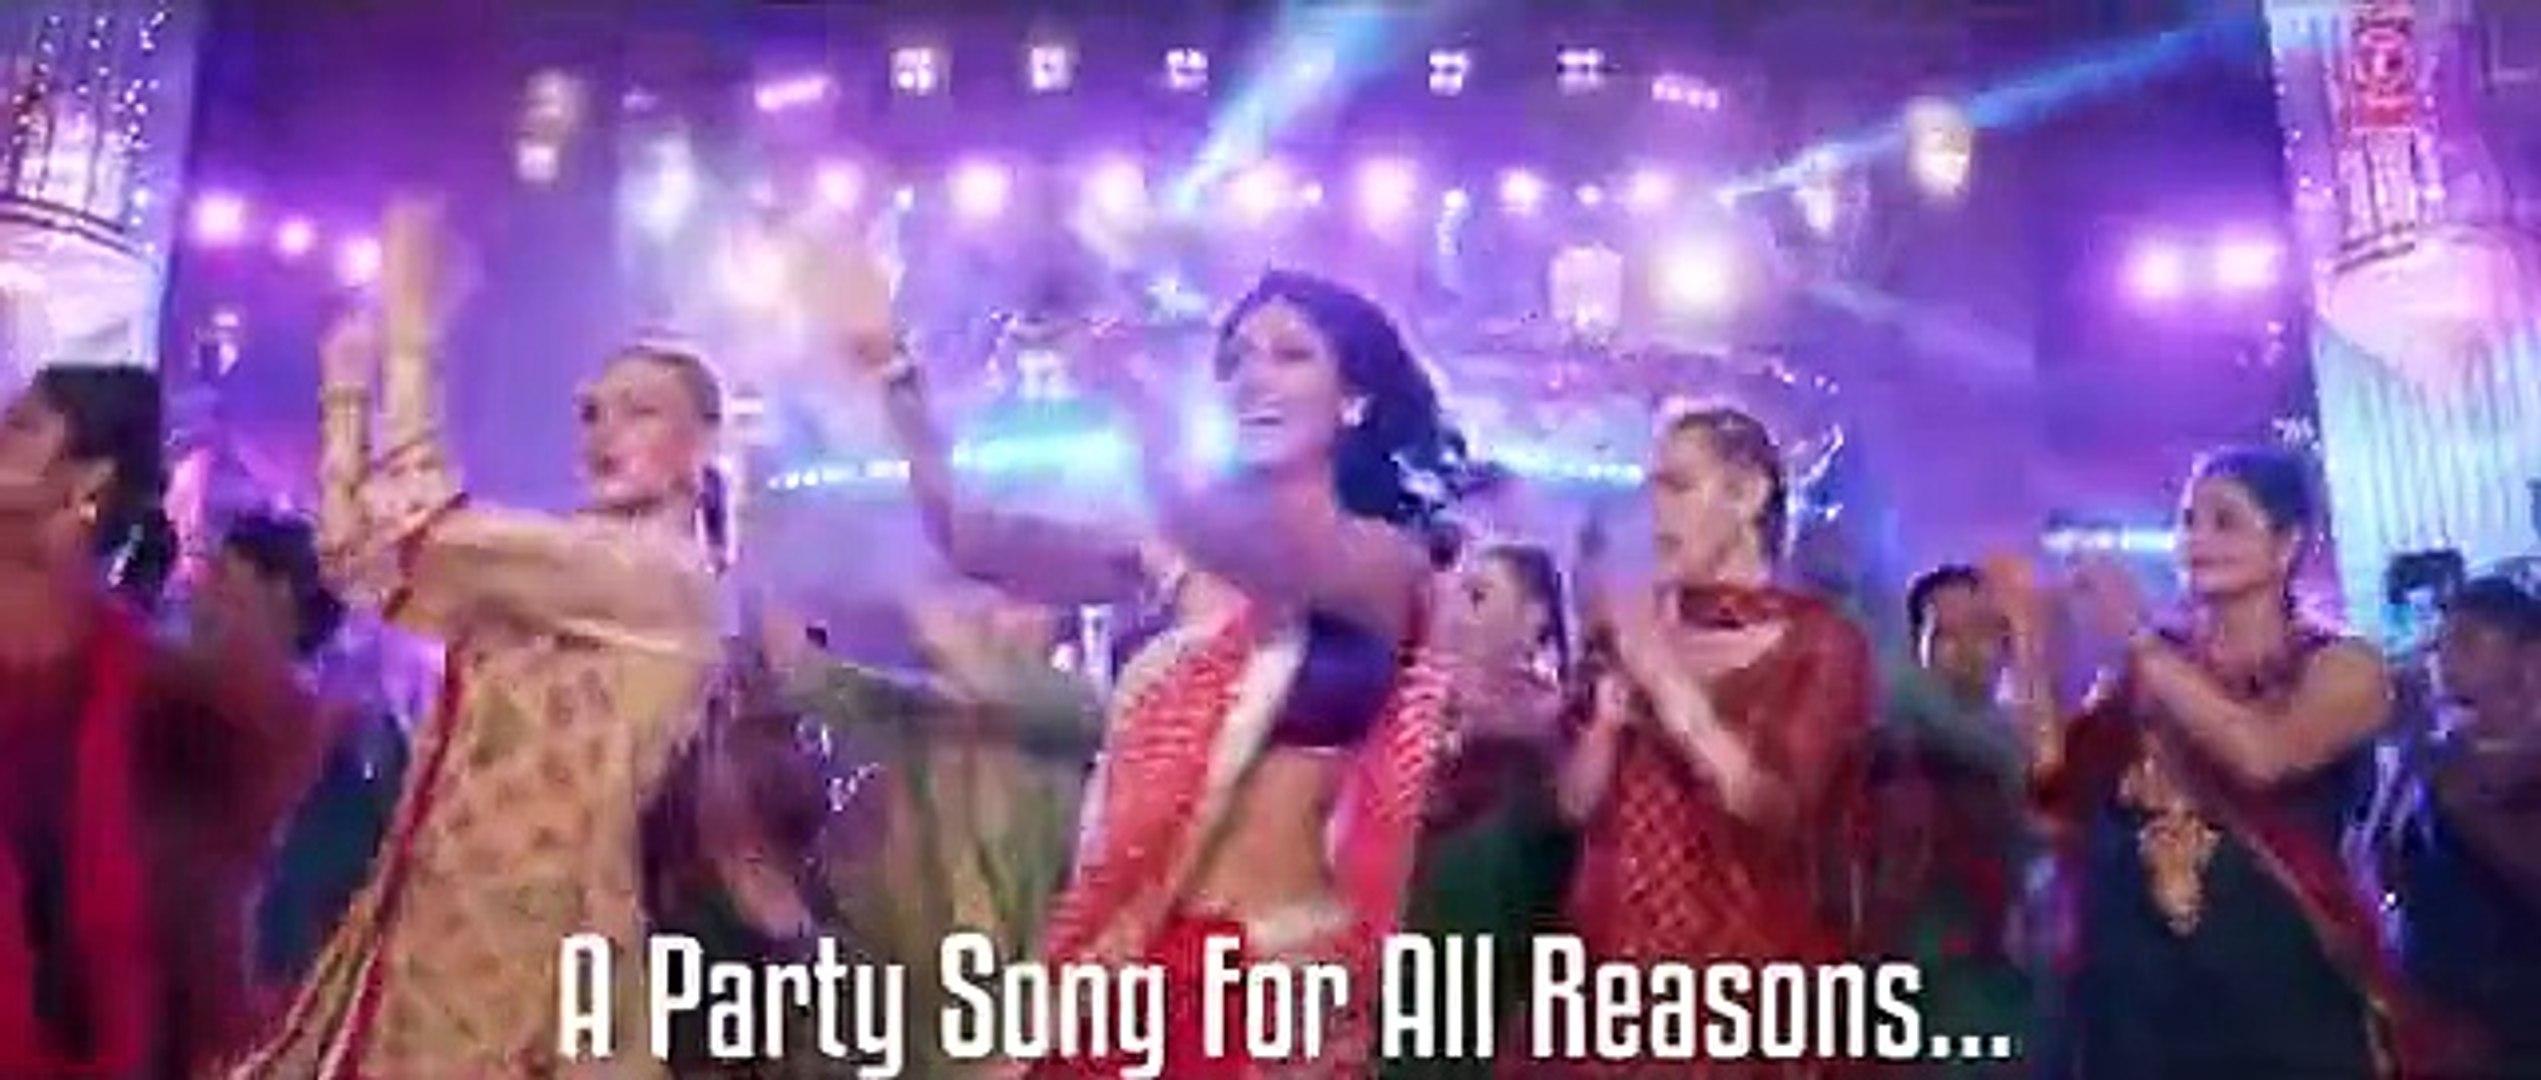 Shilpa Shetty - Wedding Da Season Video Song - Neha Kakkar, Mika Singh